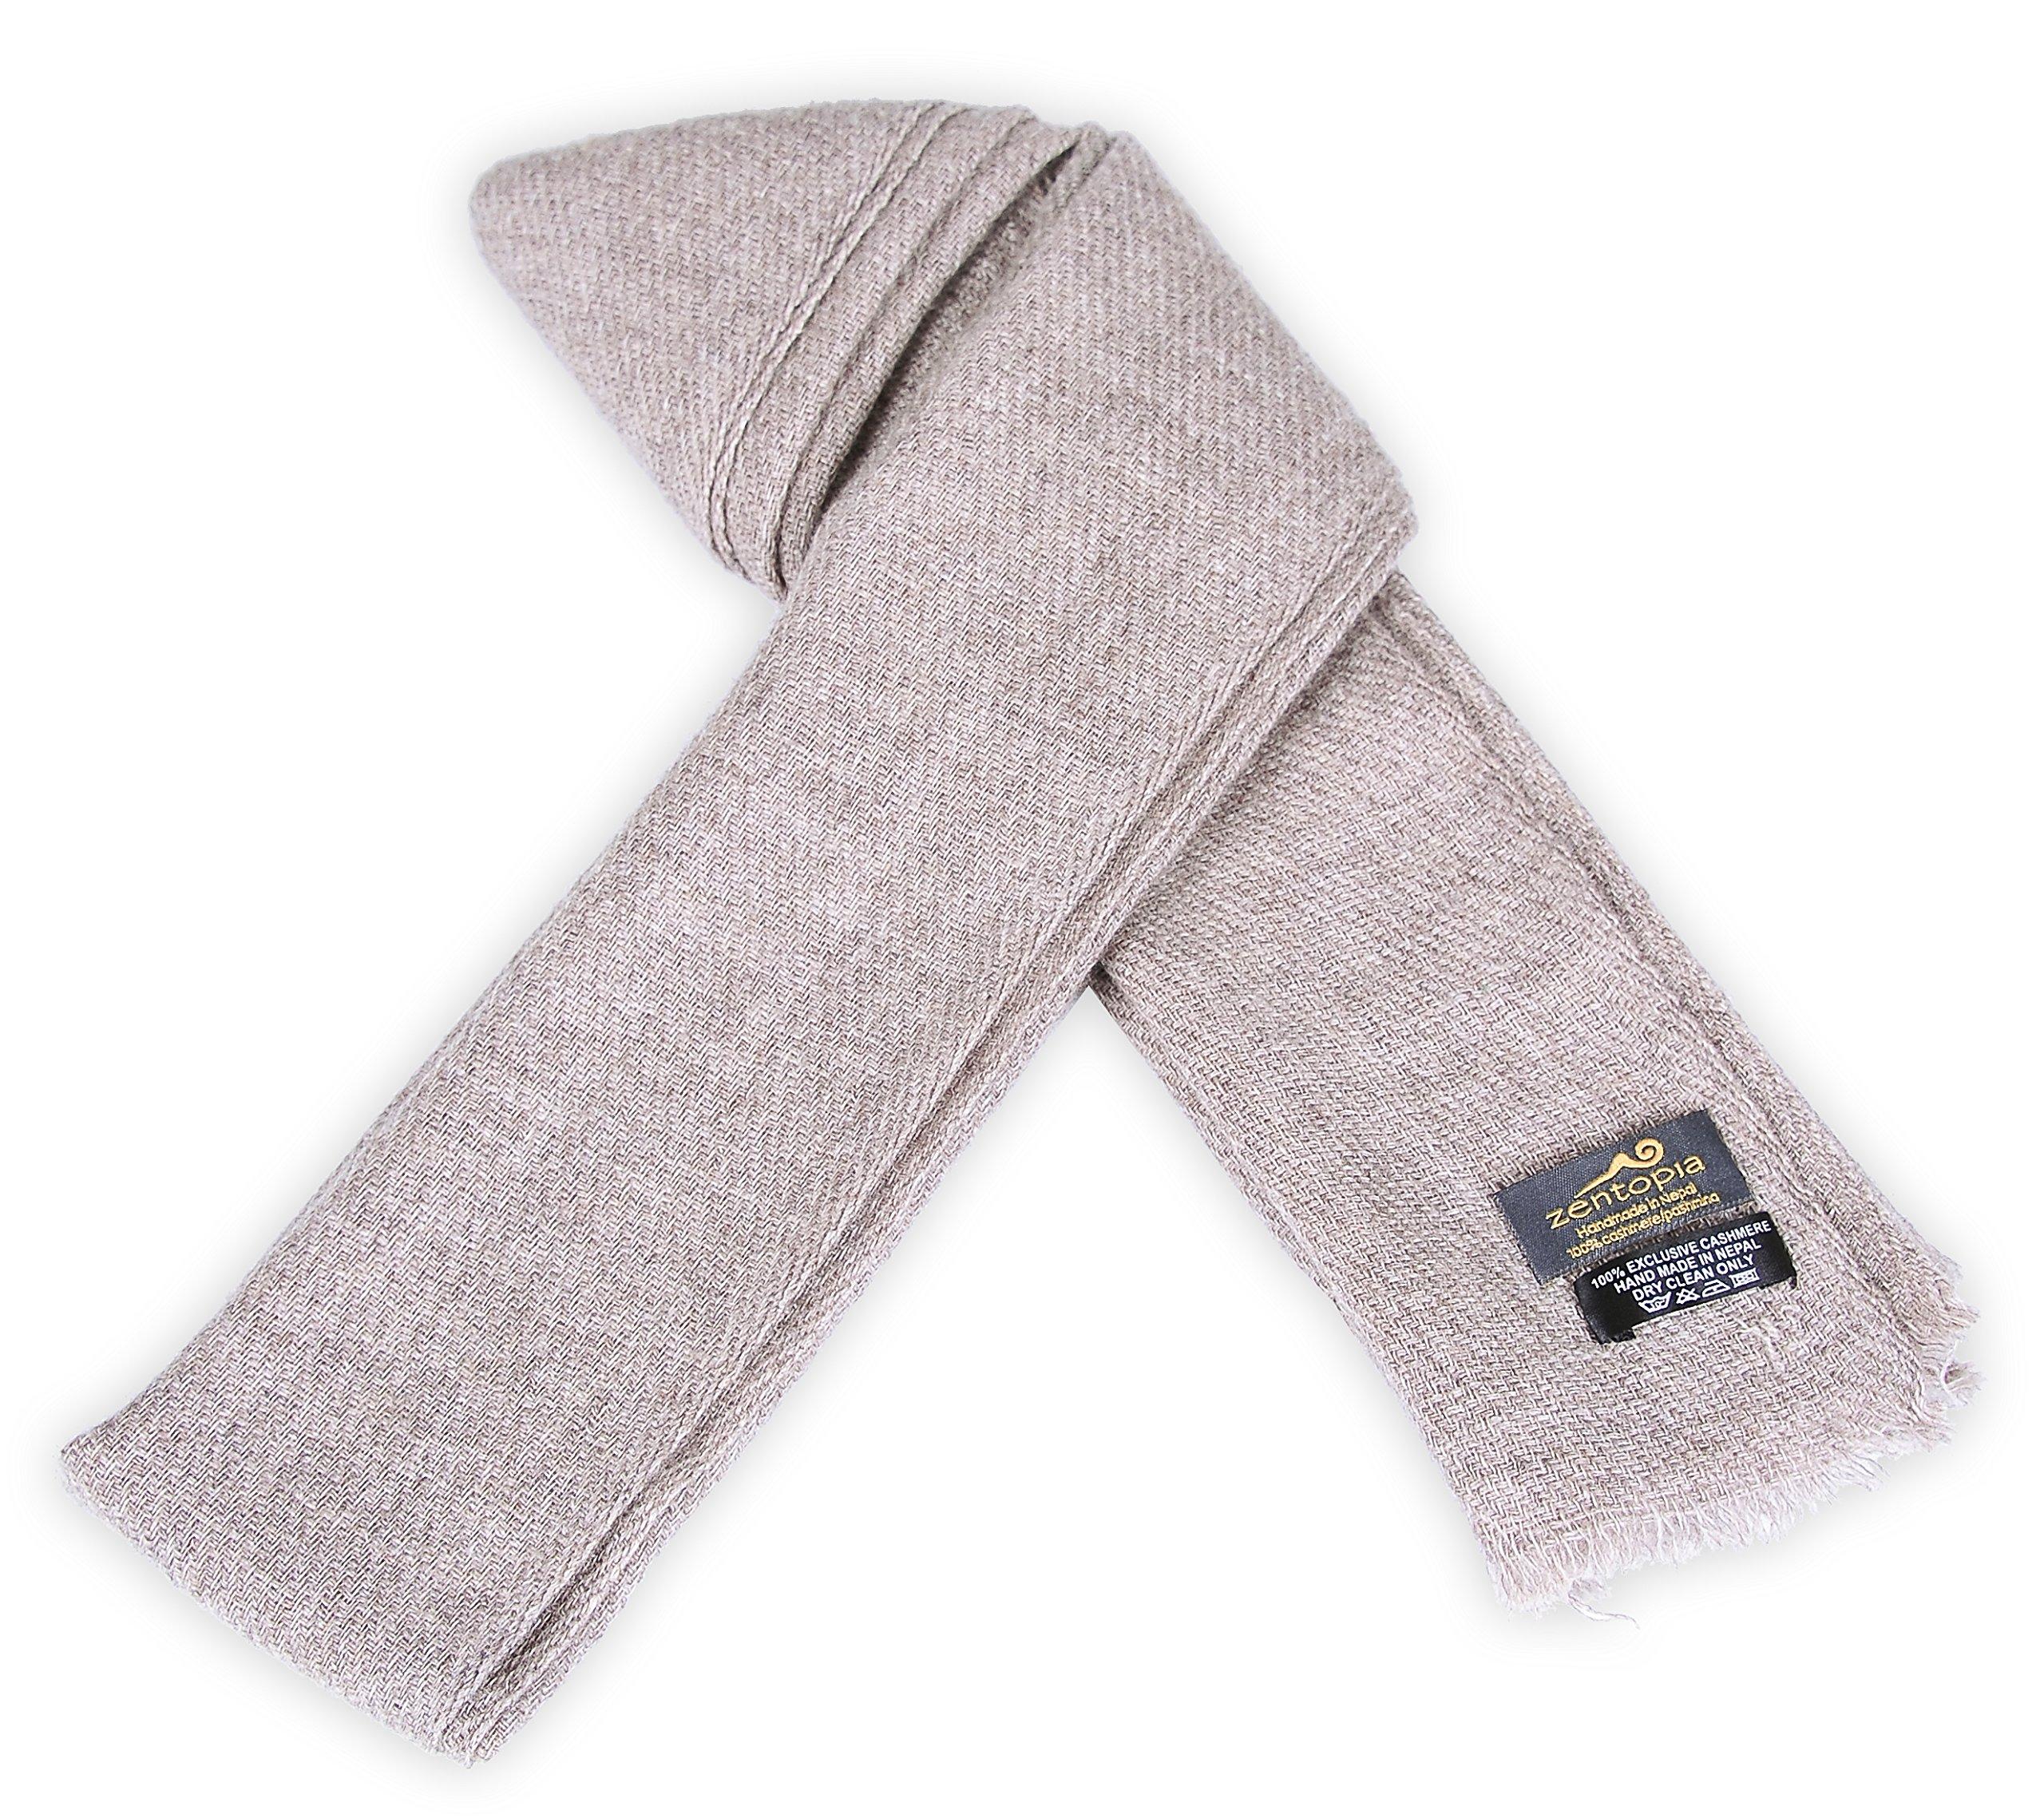 Zentopia classic 100% Grade A cashmere handmade scarf narrow cut light weight (Khaki) by Zentopia (Image #2)